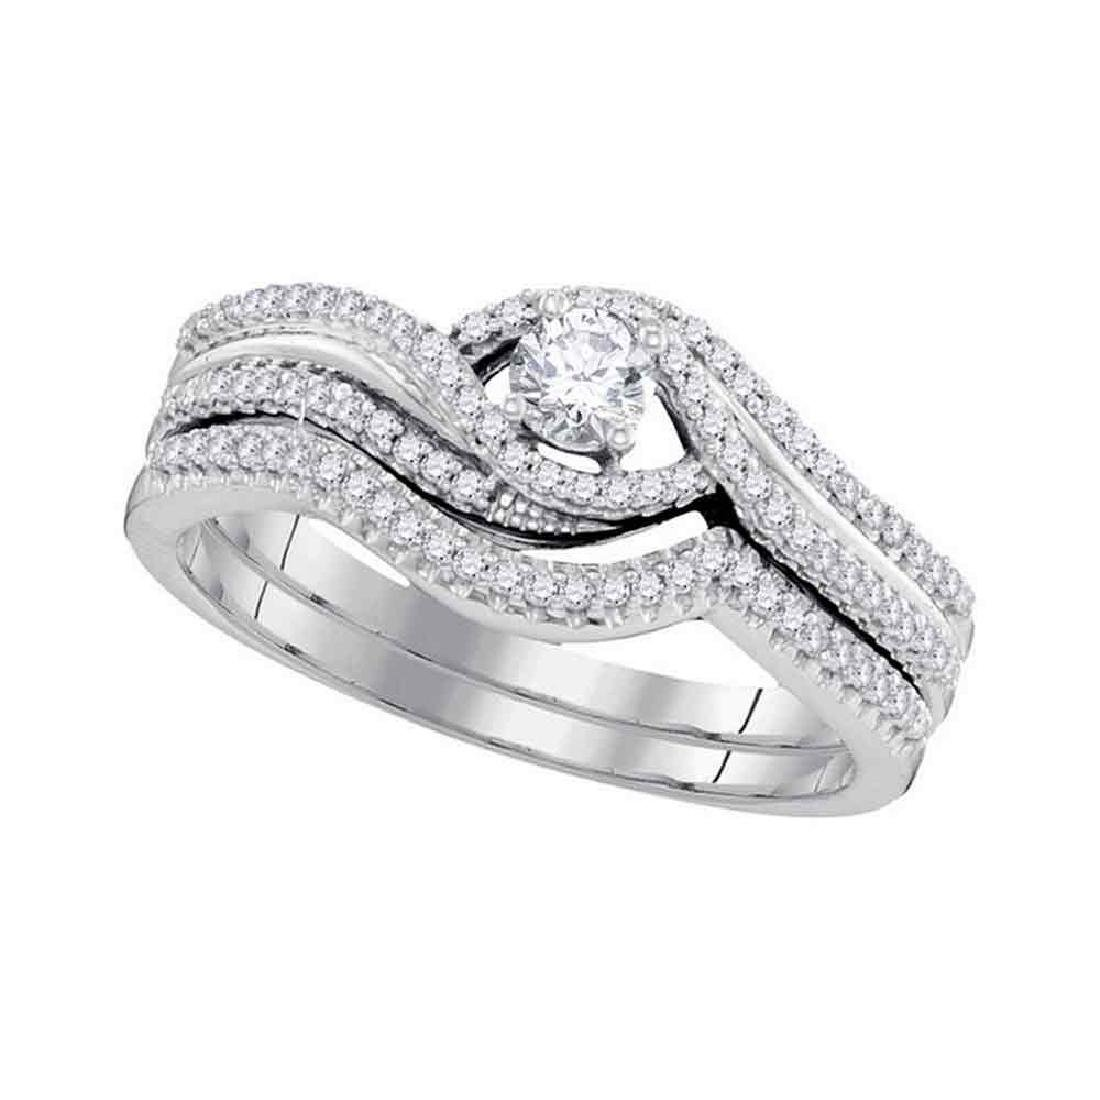 0.38 CTW Diamond Bridal Wedding Engagement Ring 10KT